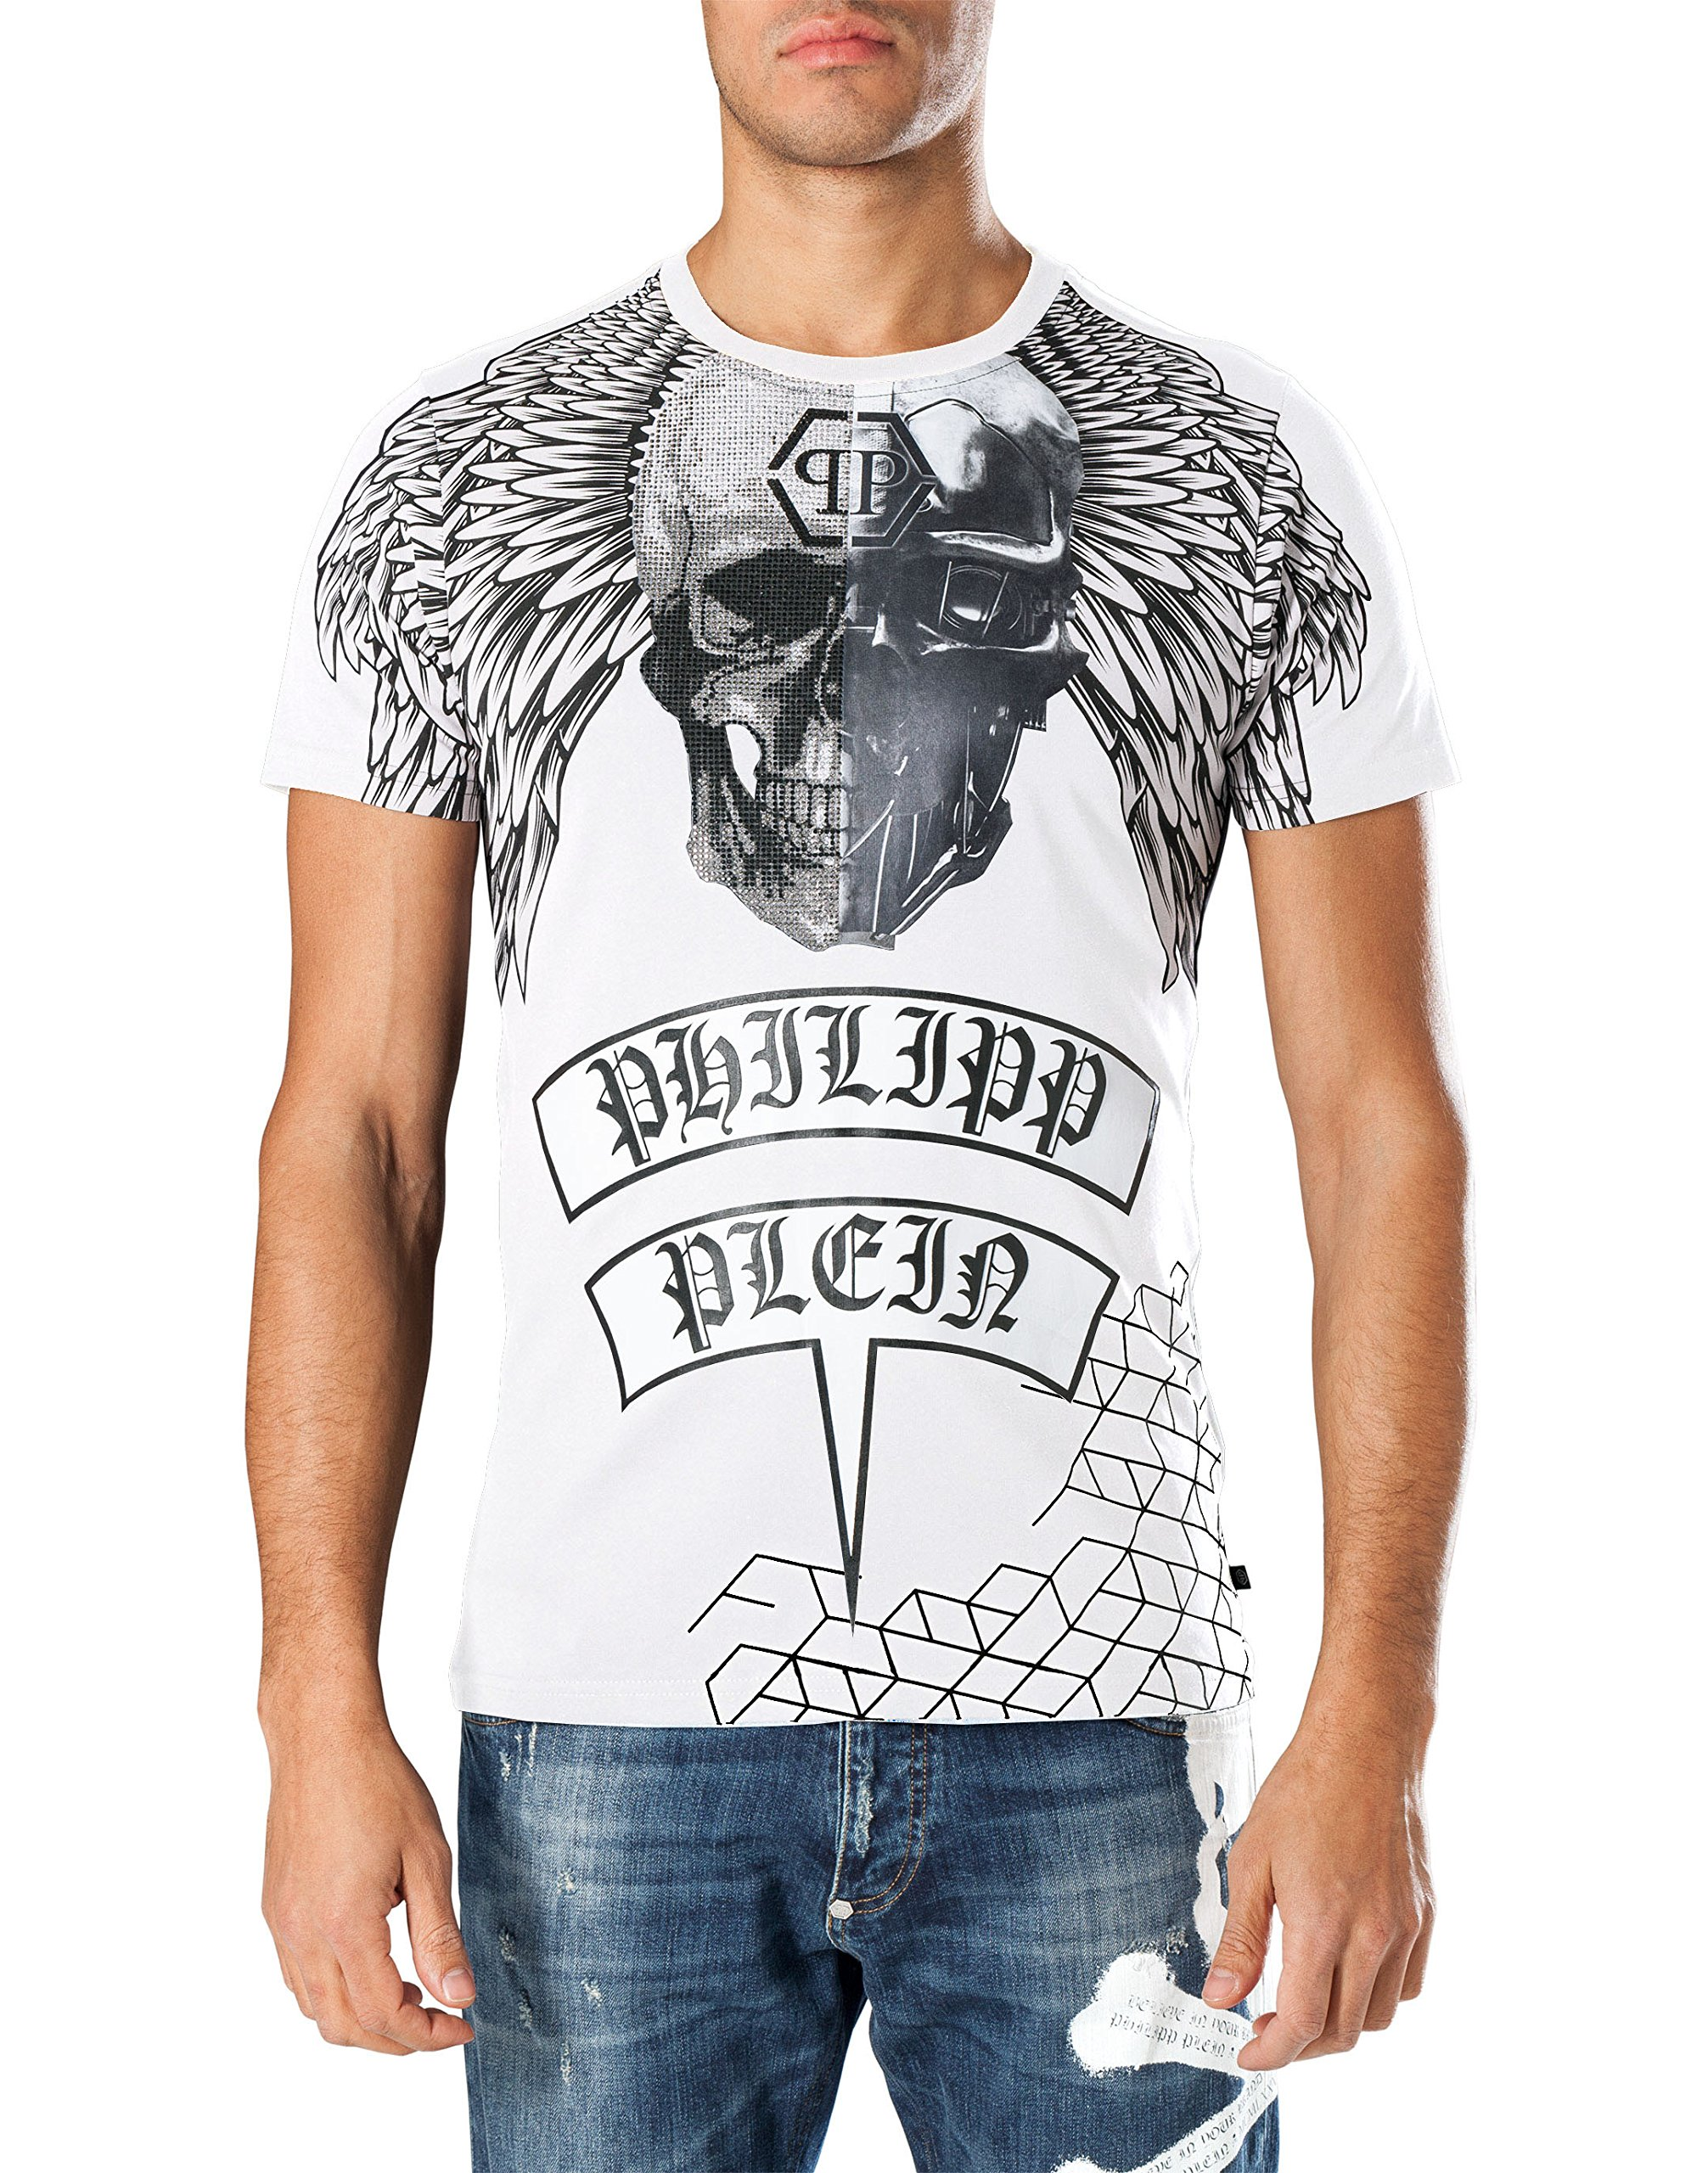 PHILIPP PLEIN Men's T-shirt Hime - white, XXL by Philipp Plein